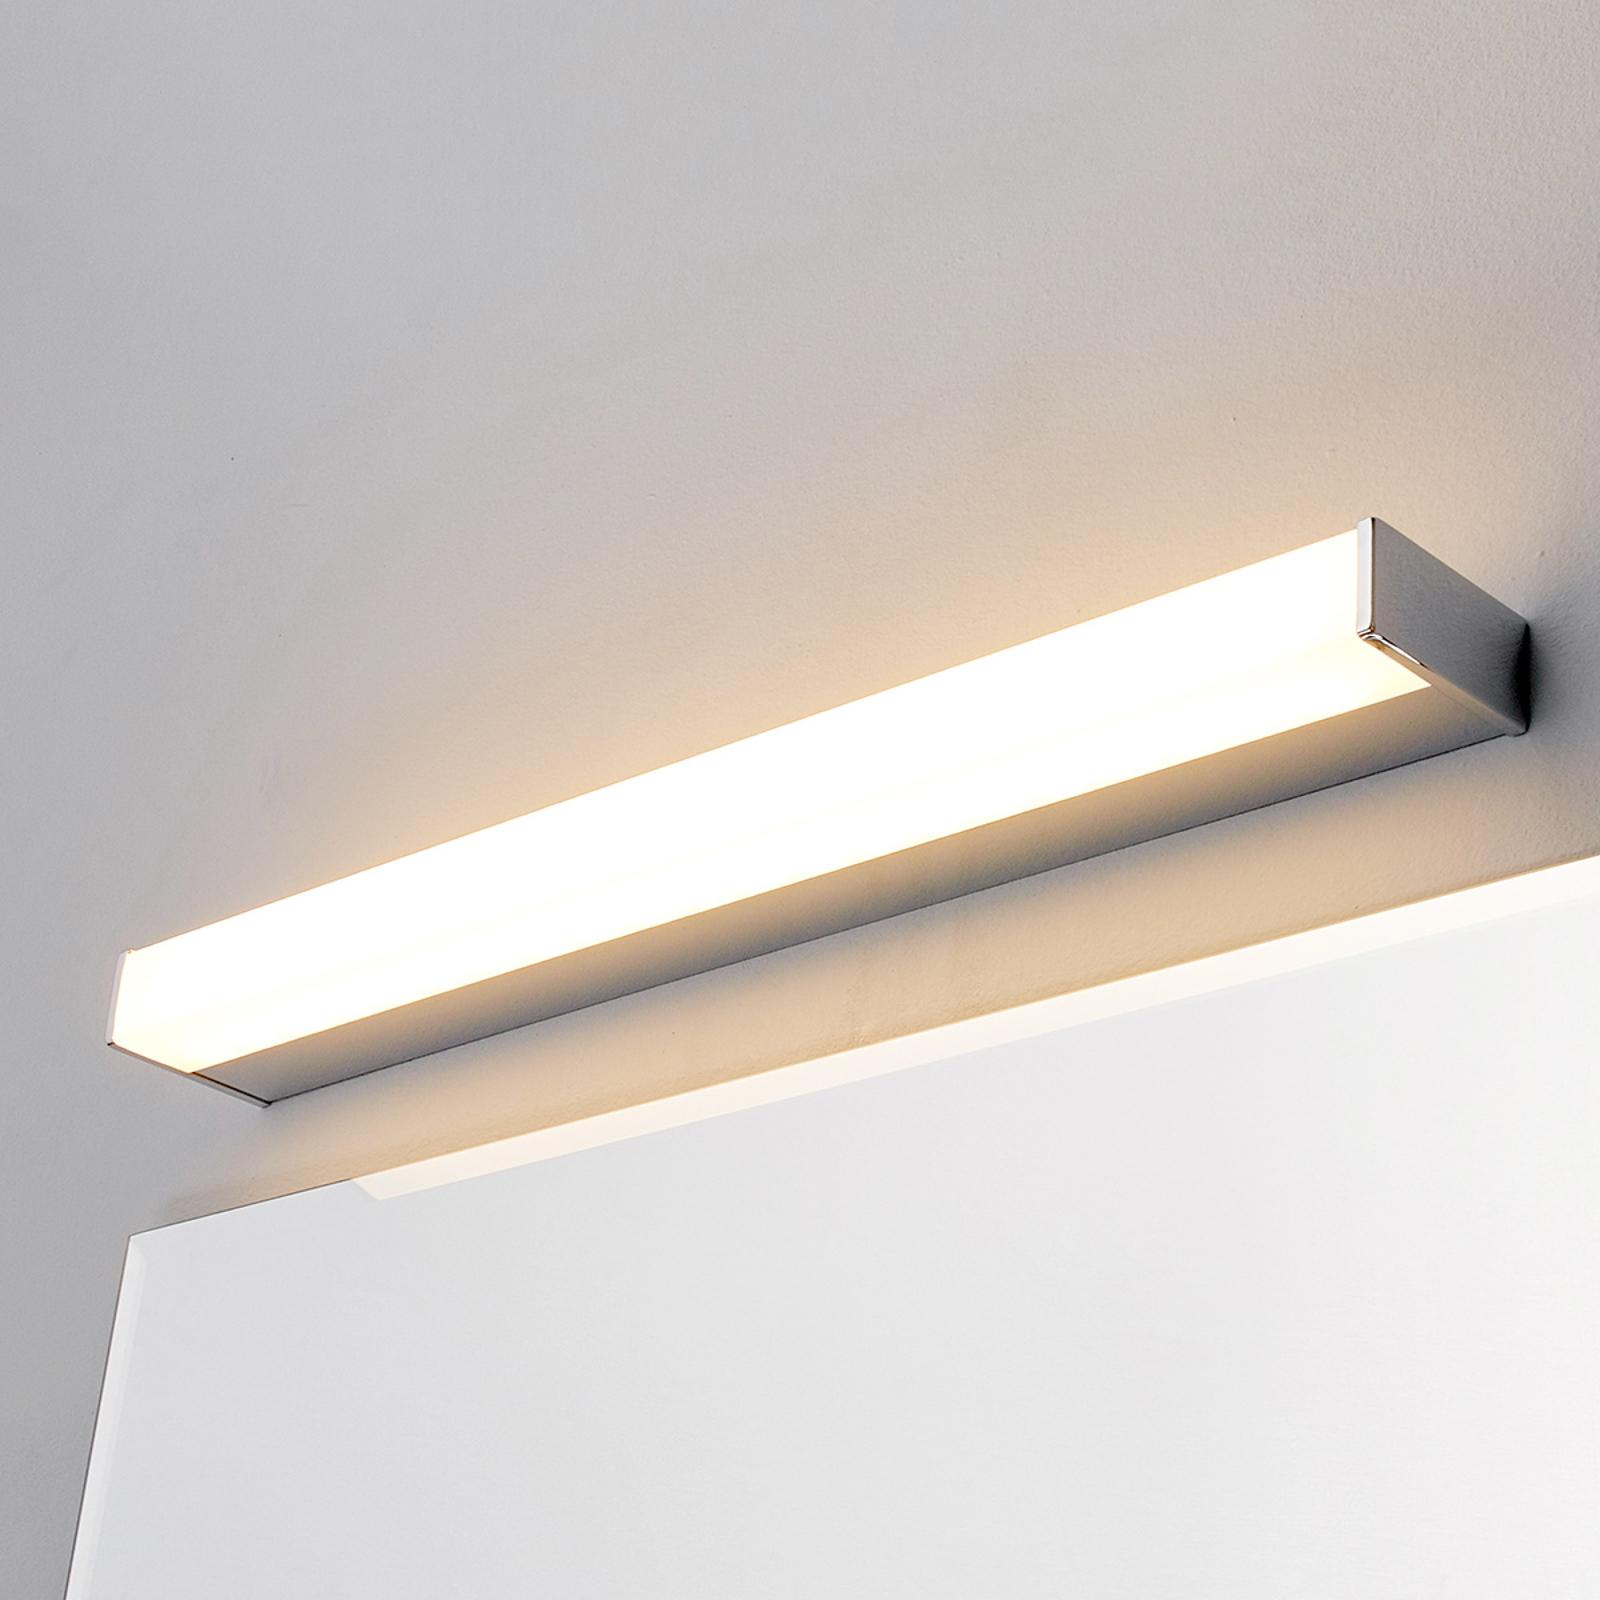 Lampada LED Philippa da bagno, angolare 58,8cm